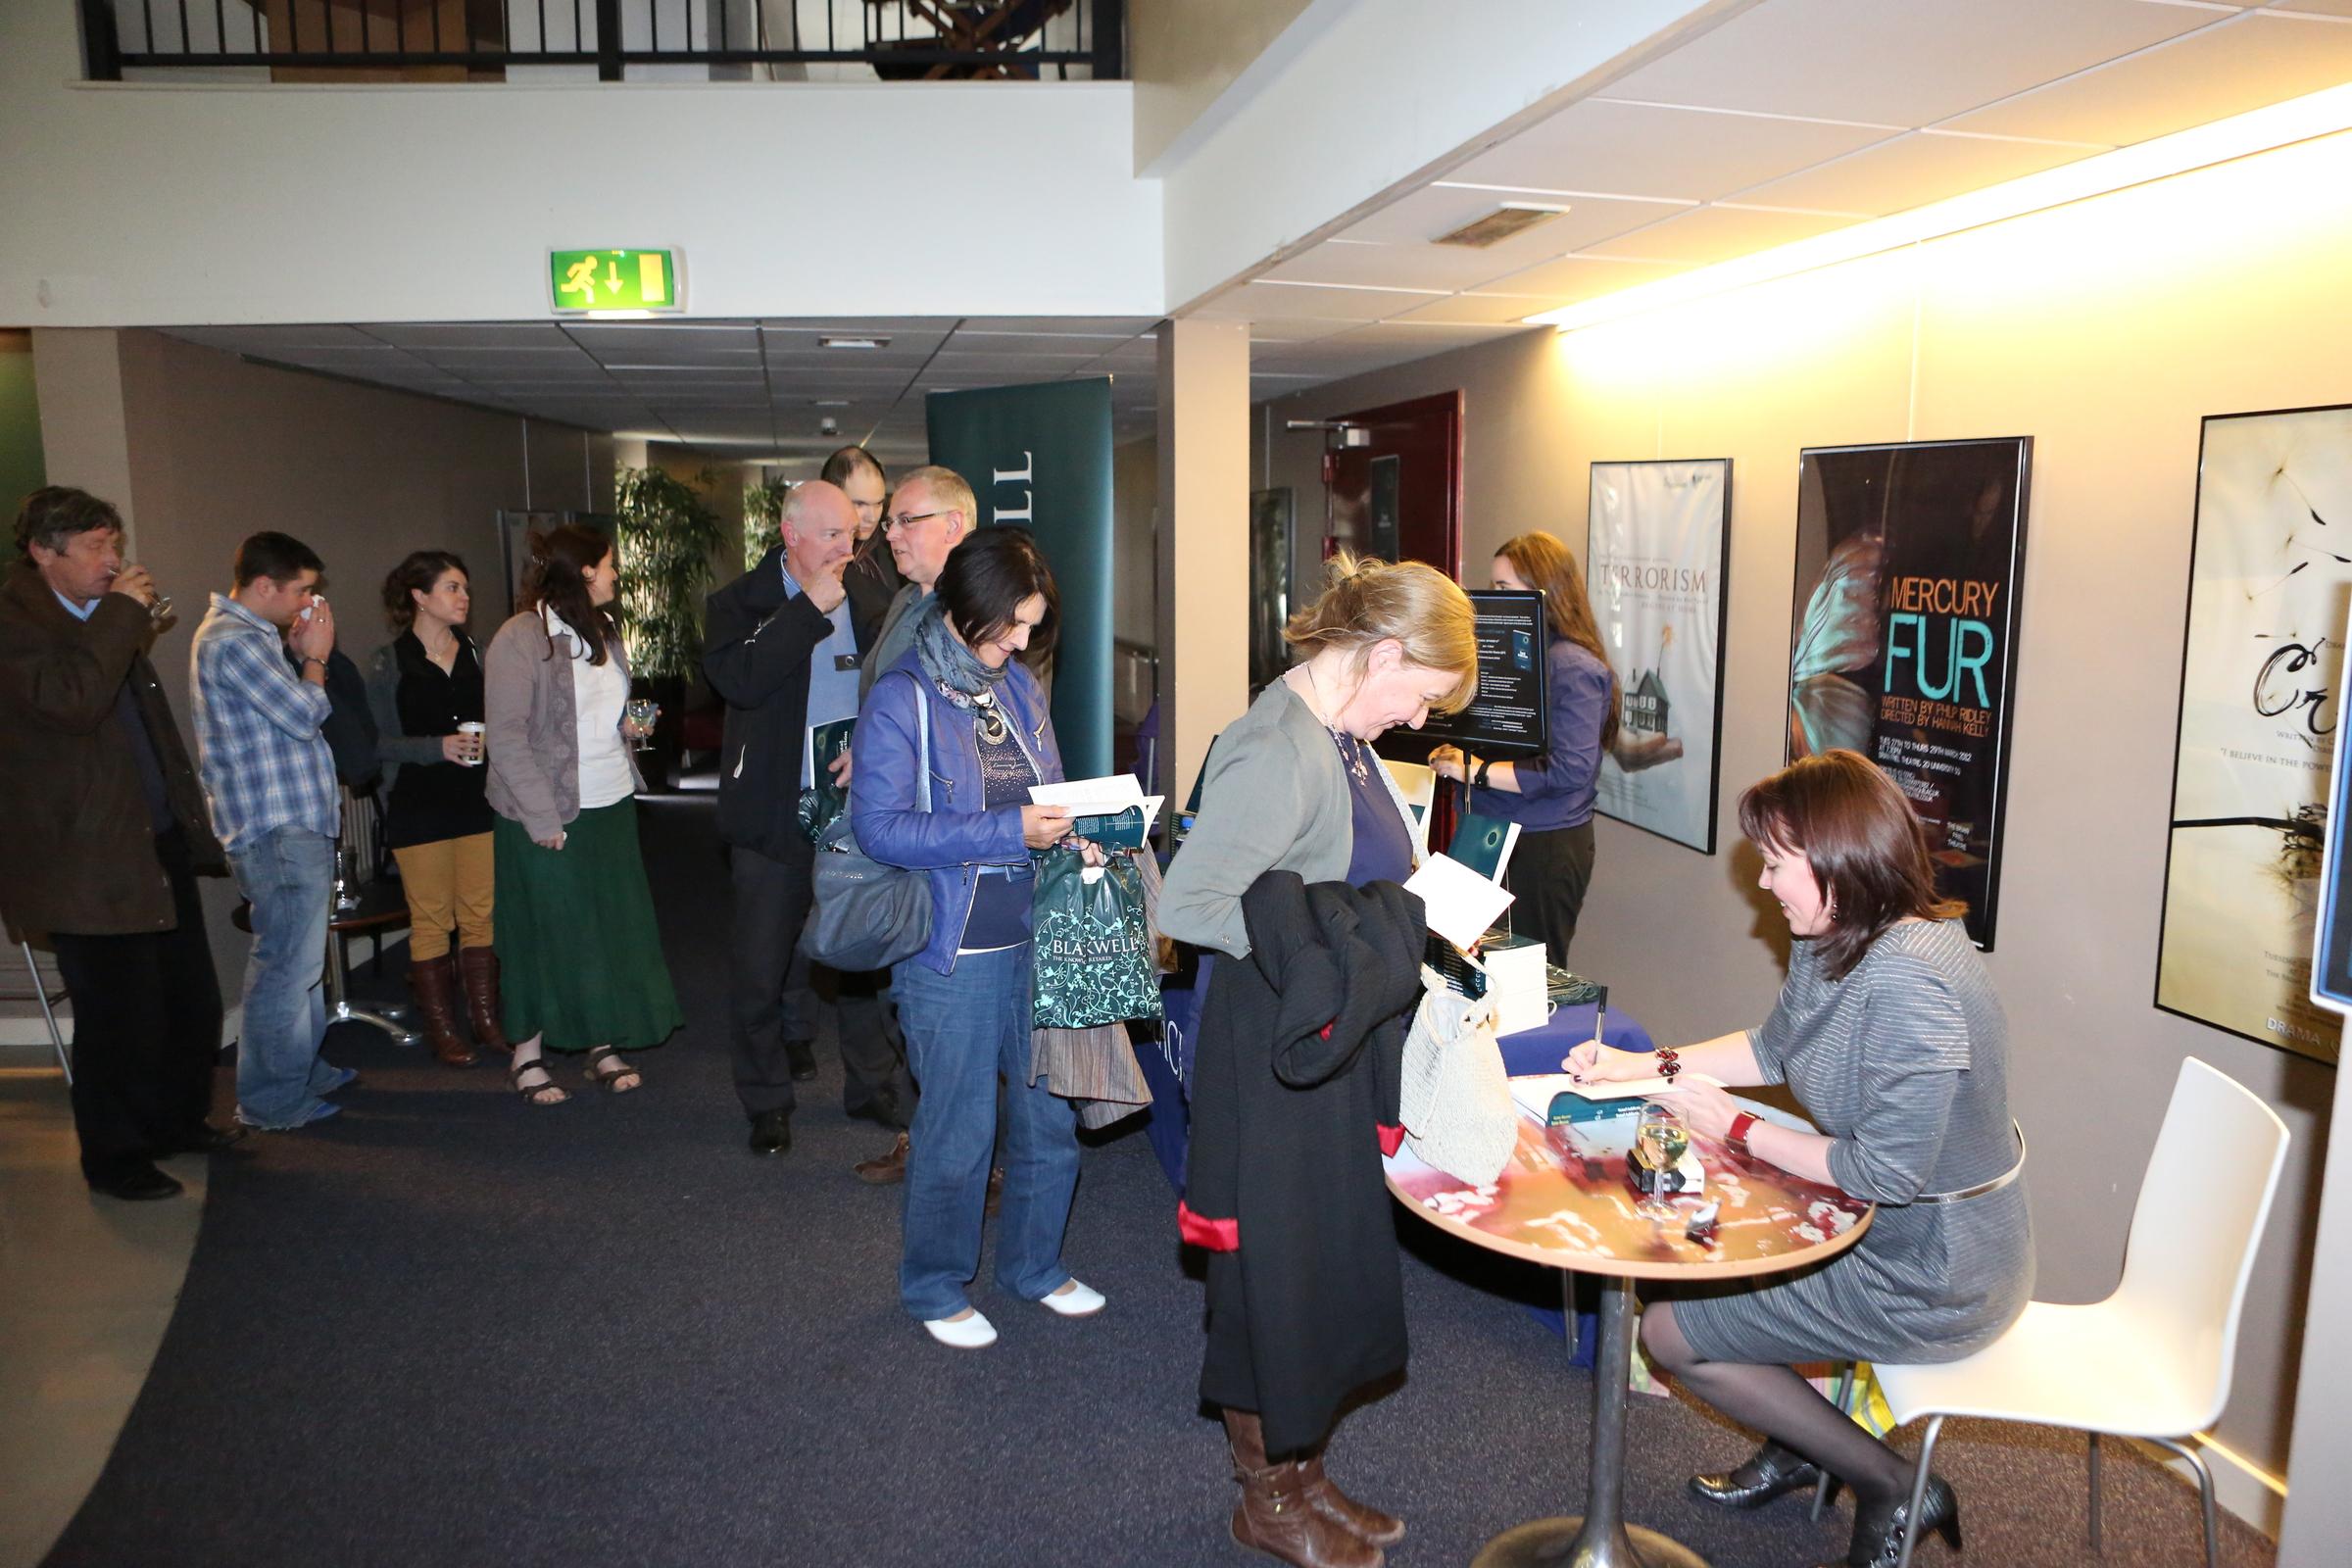 Belfast book launch party.  (c) 2012, Paul McErlane